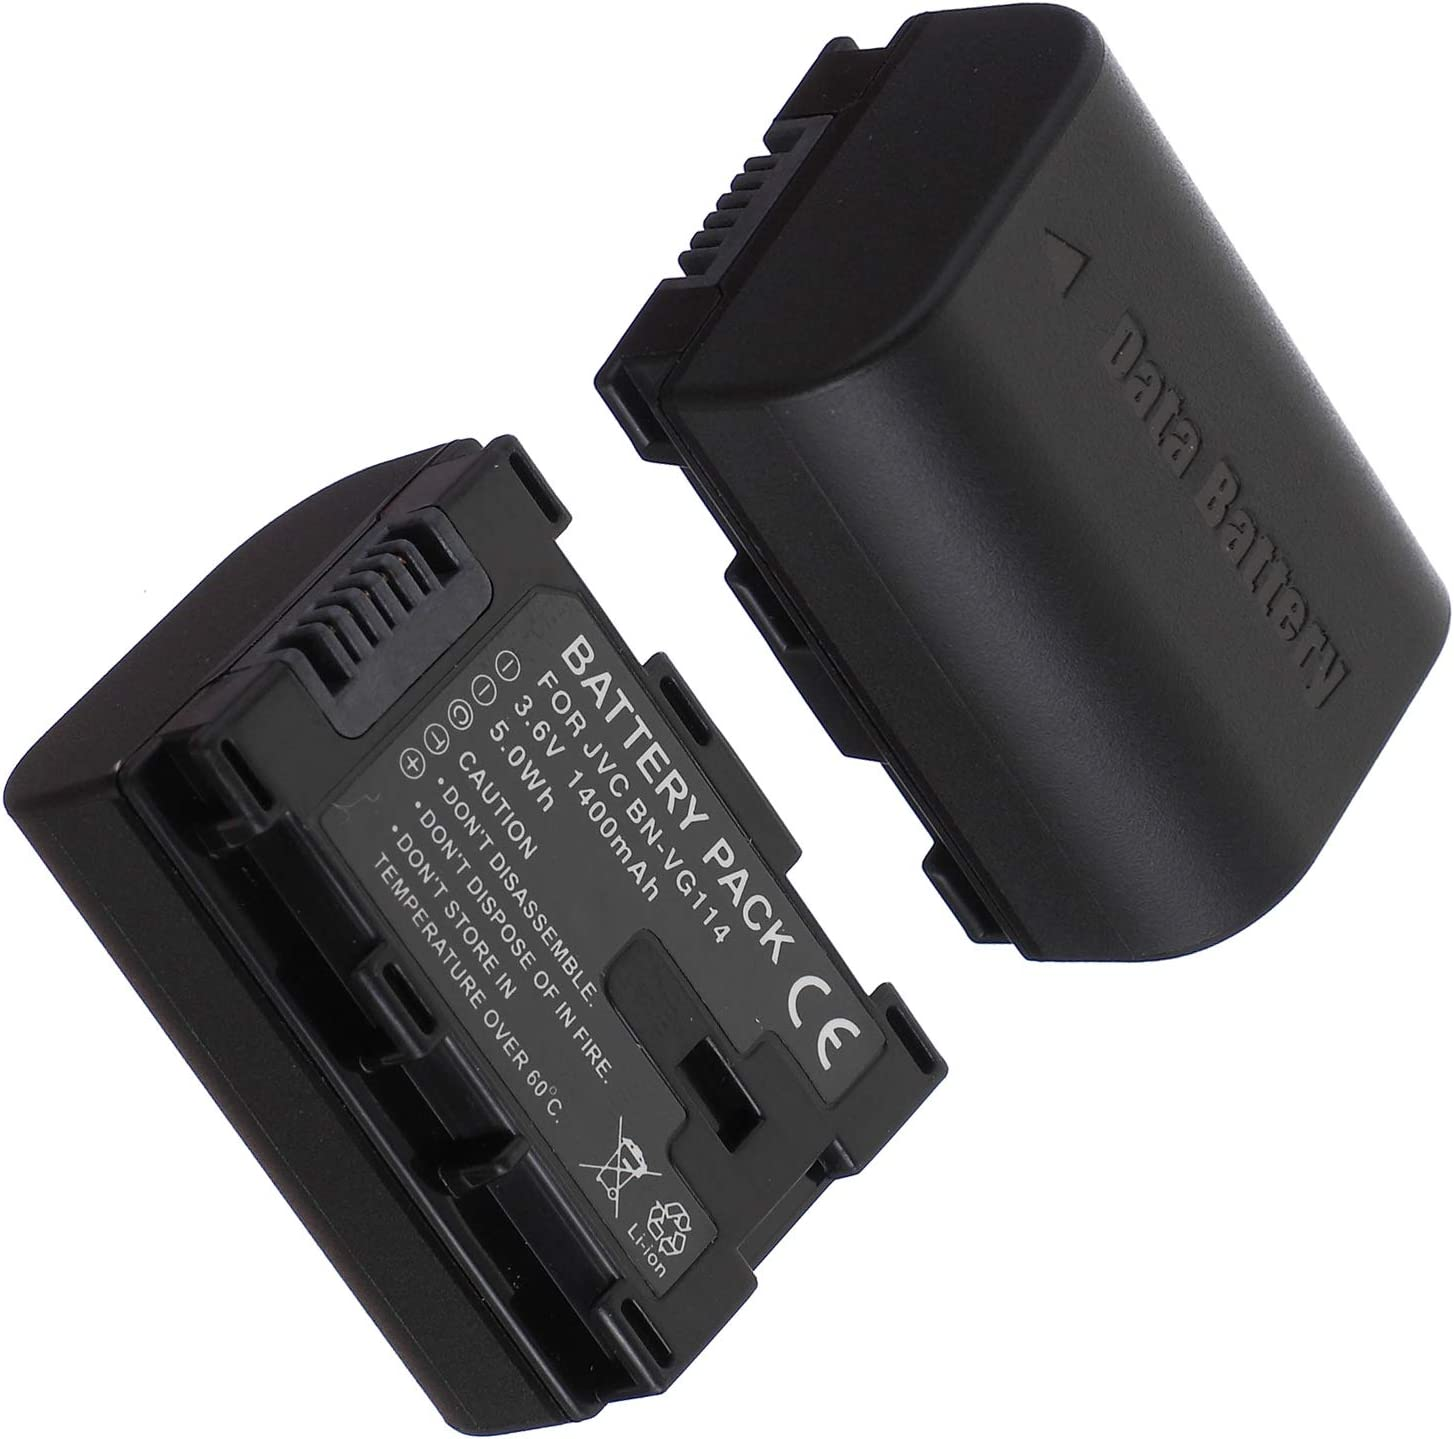 GZ-E205BEU Full HD Memory Camcorder LCD USB Battery Charger for JVC Everio GZ-E205 GZ-E205BE GZ-E205B